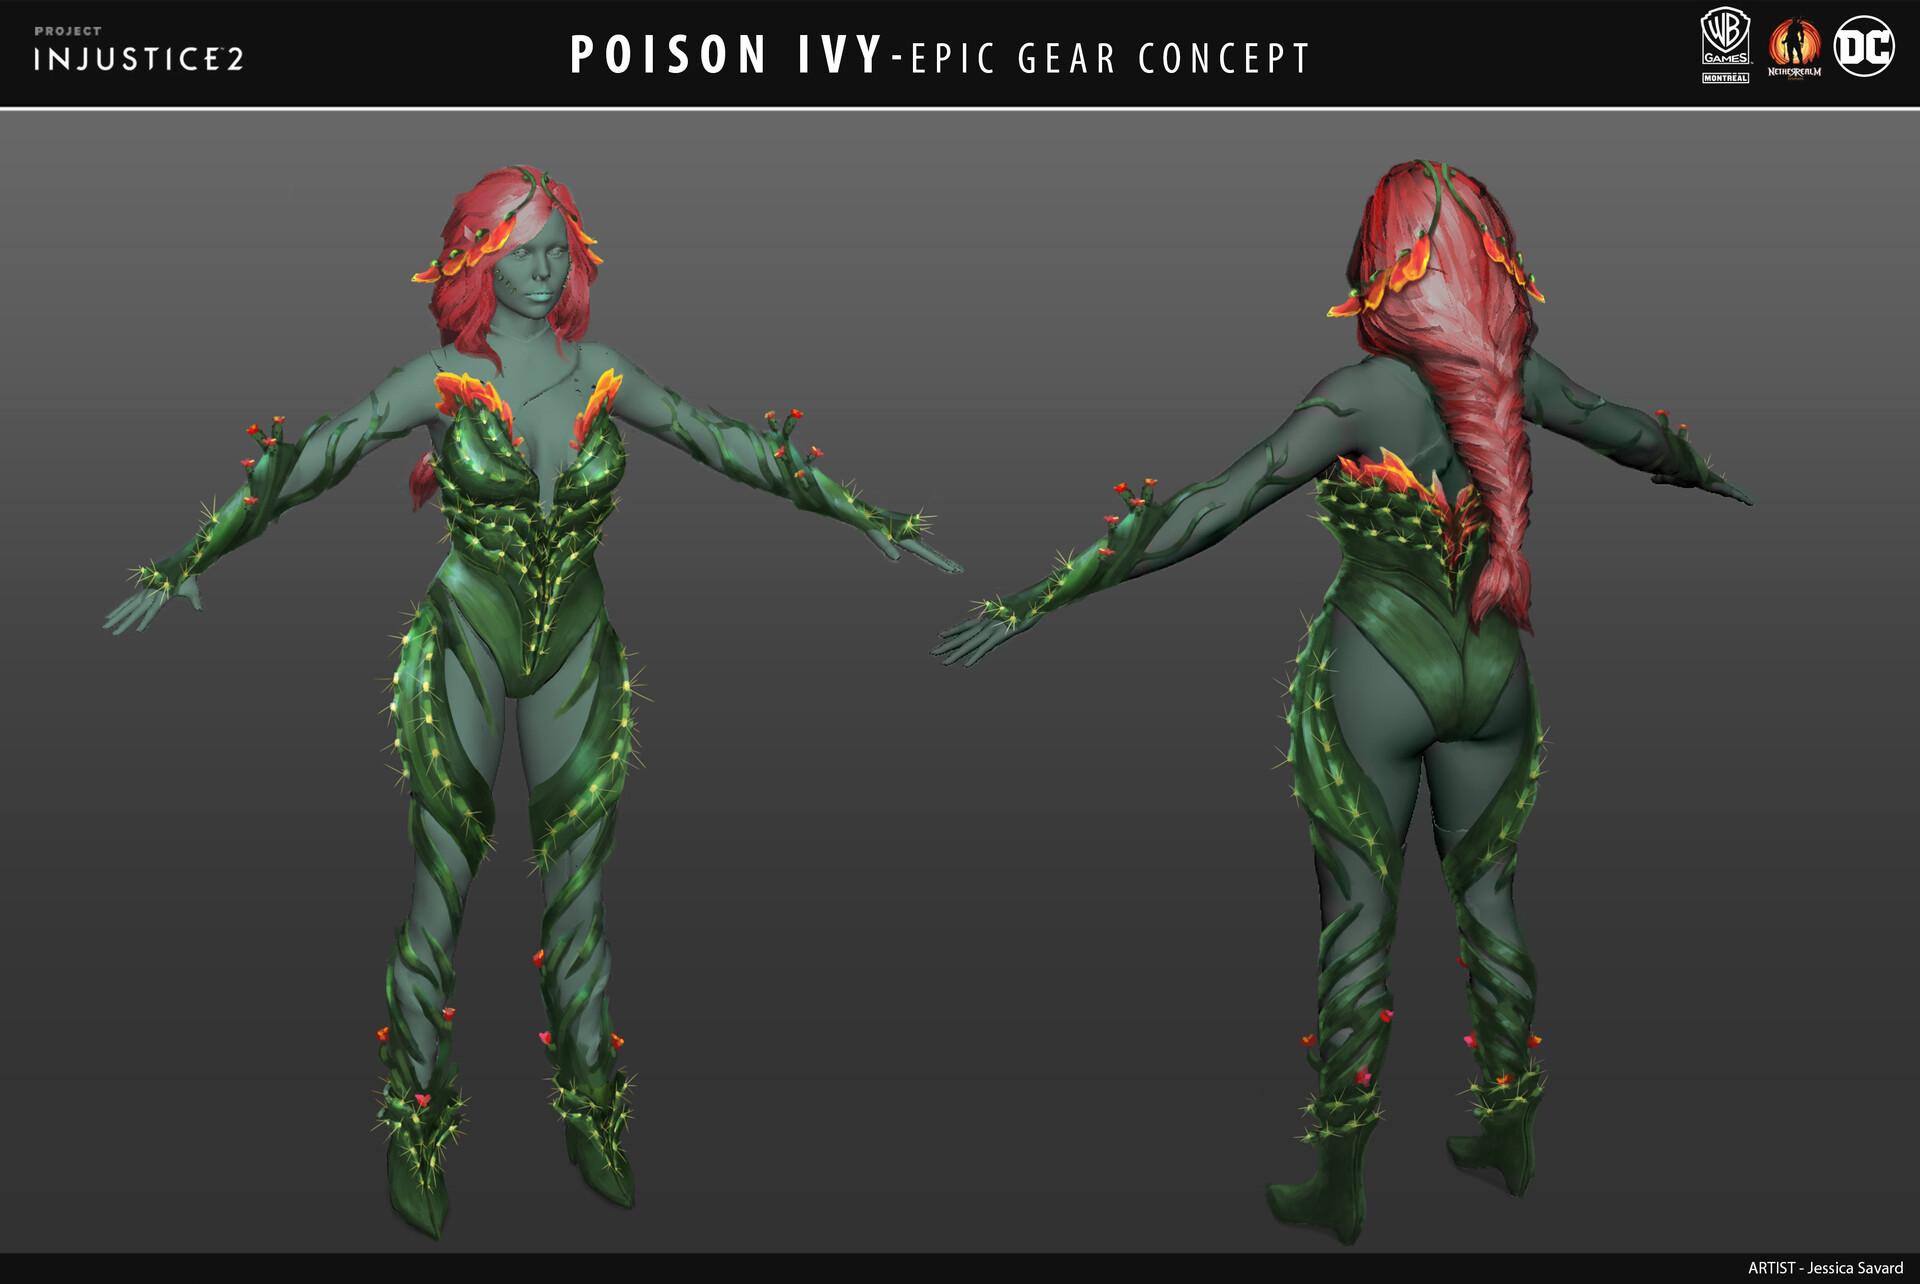 Injustice 2 Poison Ivy Concept Art